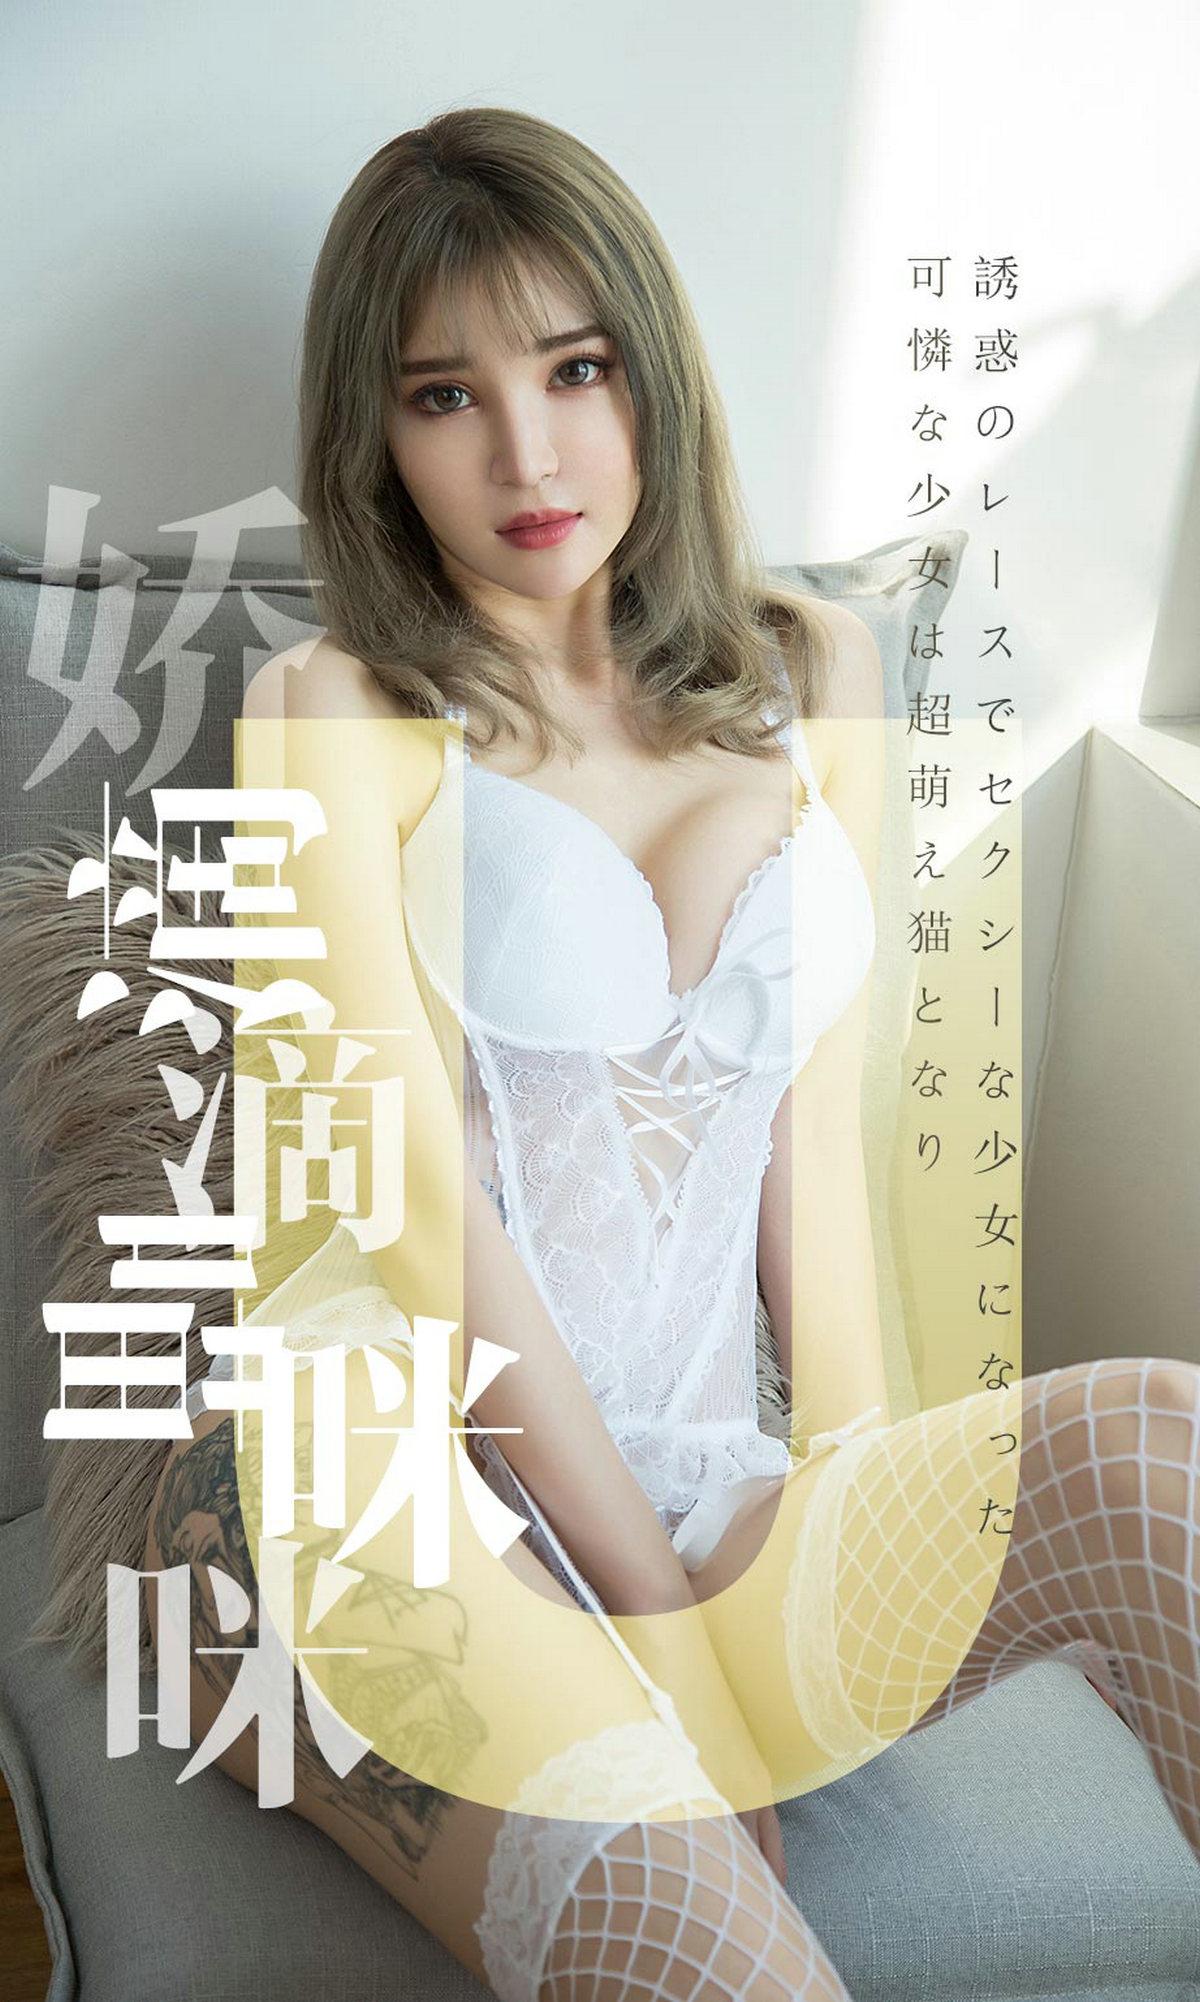 [Ugirls]爱尤物 No.1416 娇滴滴喵咪咪 波鱼